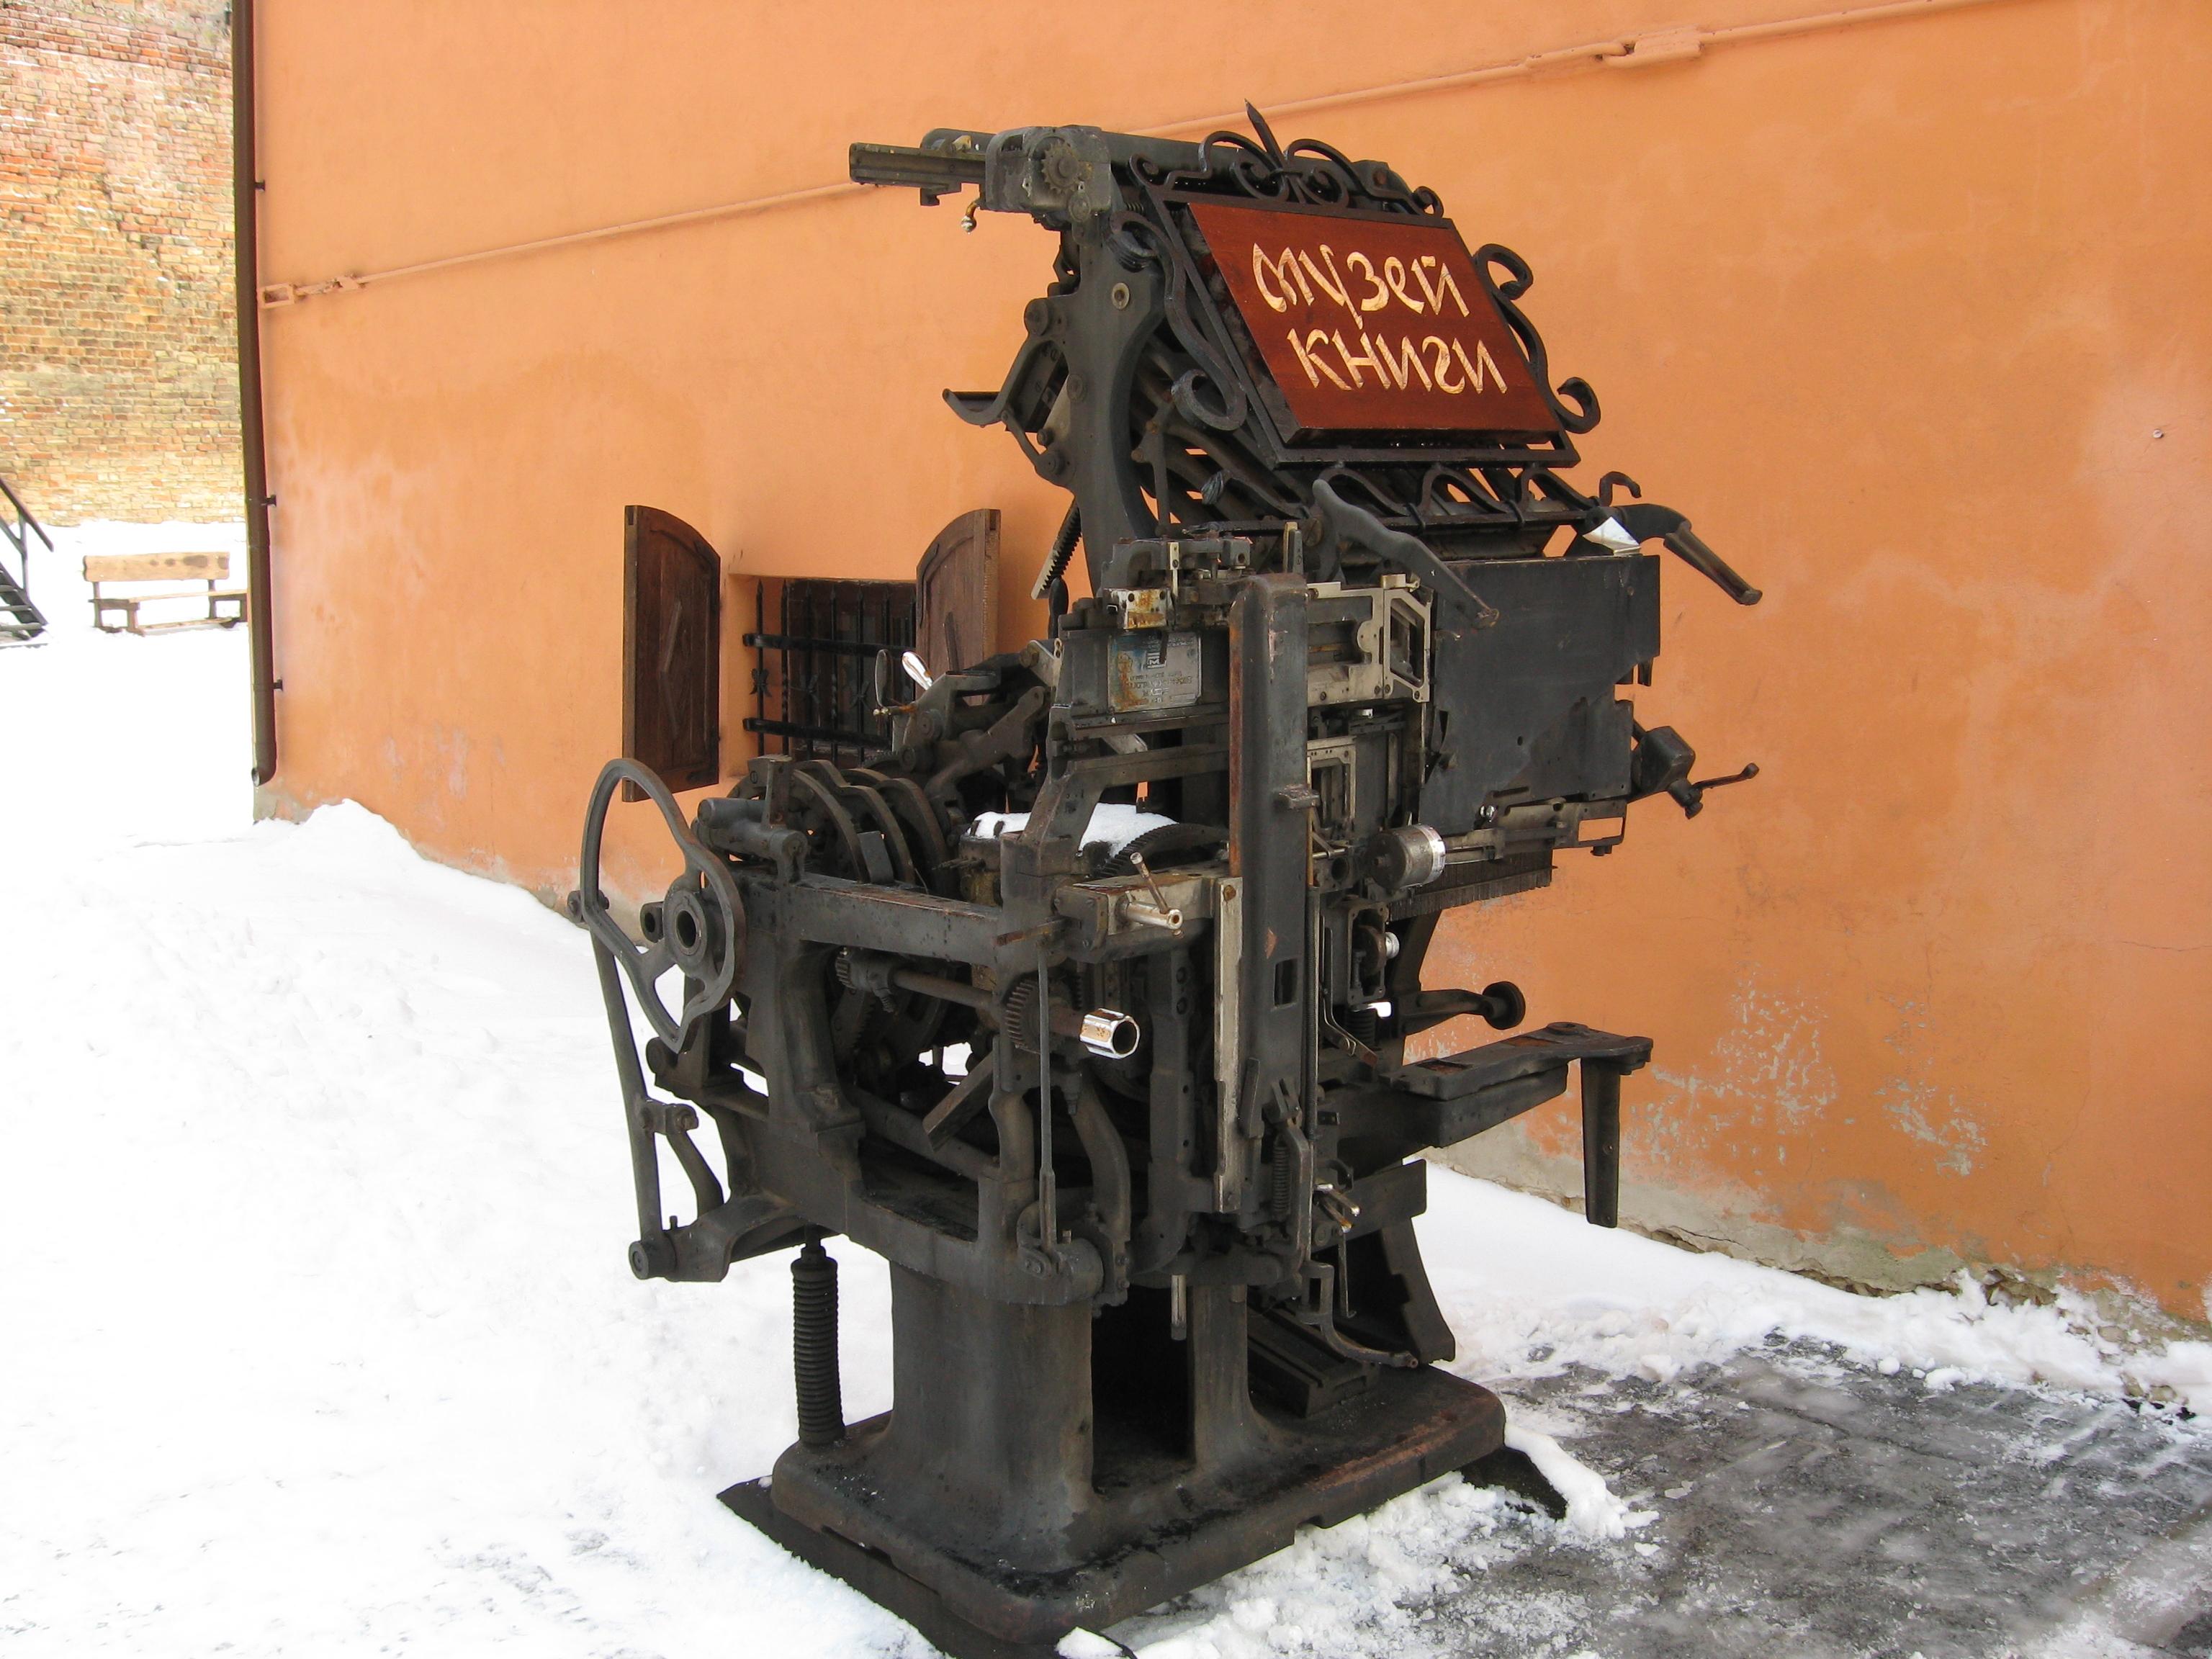 File:Old printing press - panoramio jpg - Wikimedia Commons